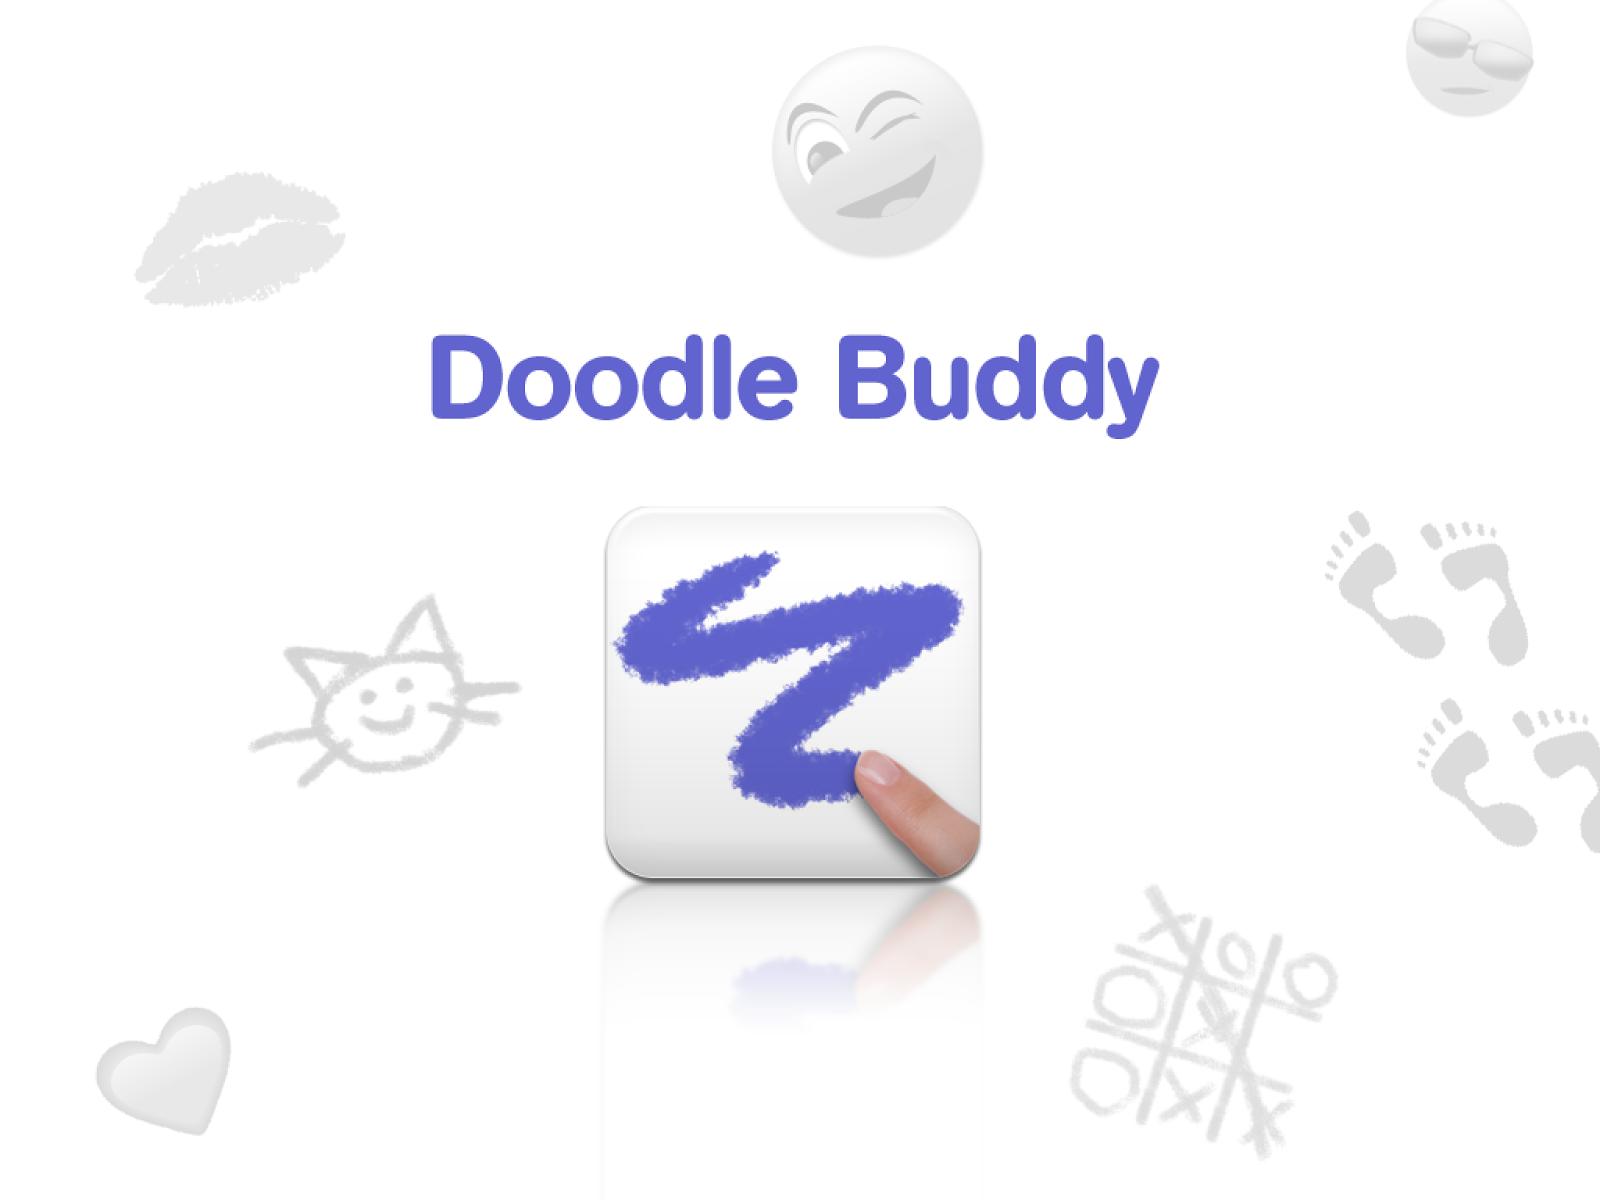 http://2.bp.blogspot.com/-MTYv3K6xJzM/Uf2IZk8kOkI/AAAAAAAAEHU/D9_4BKZS0yQ/s1600/Doodle+buddy.png